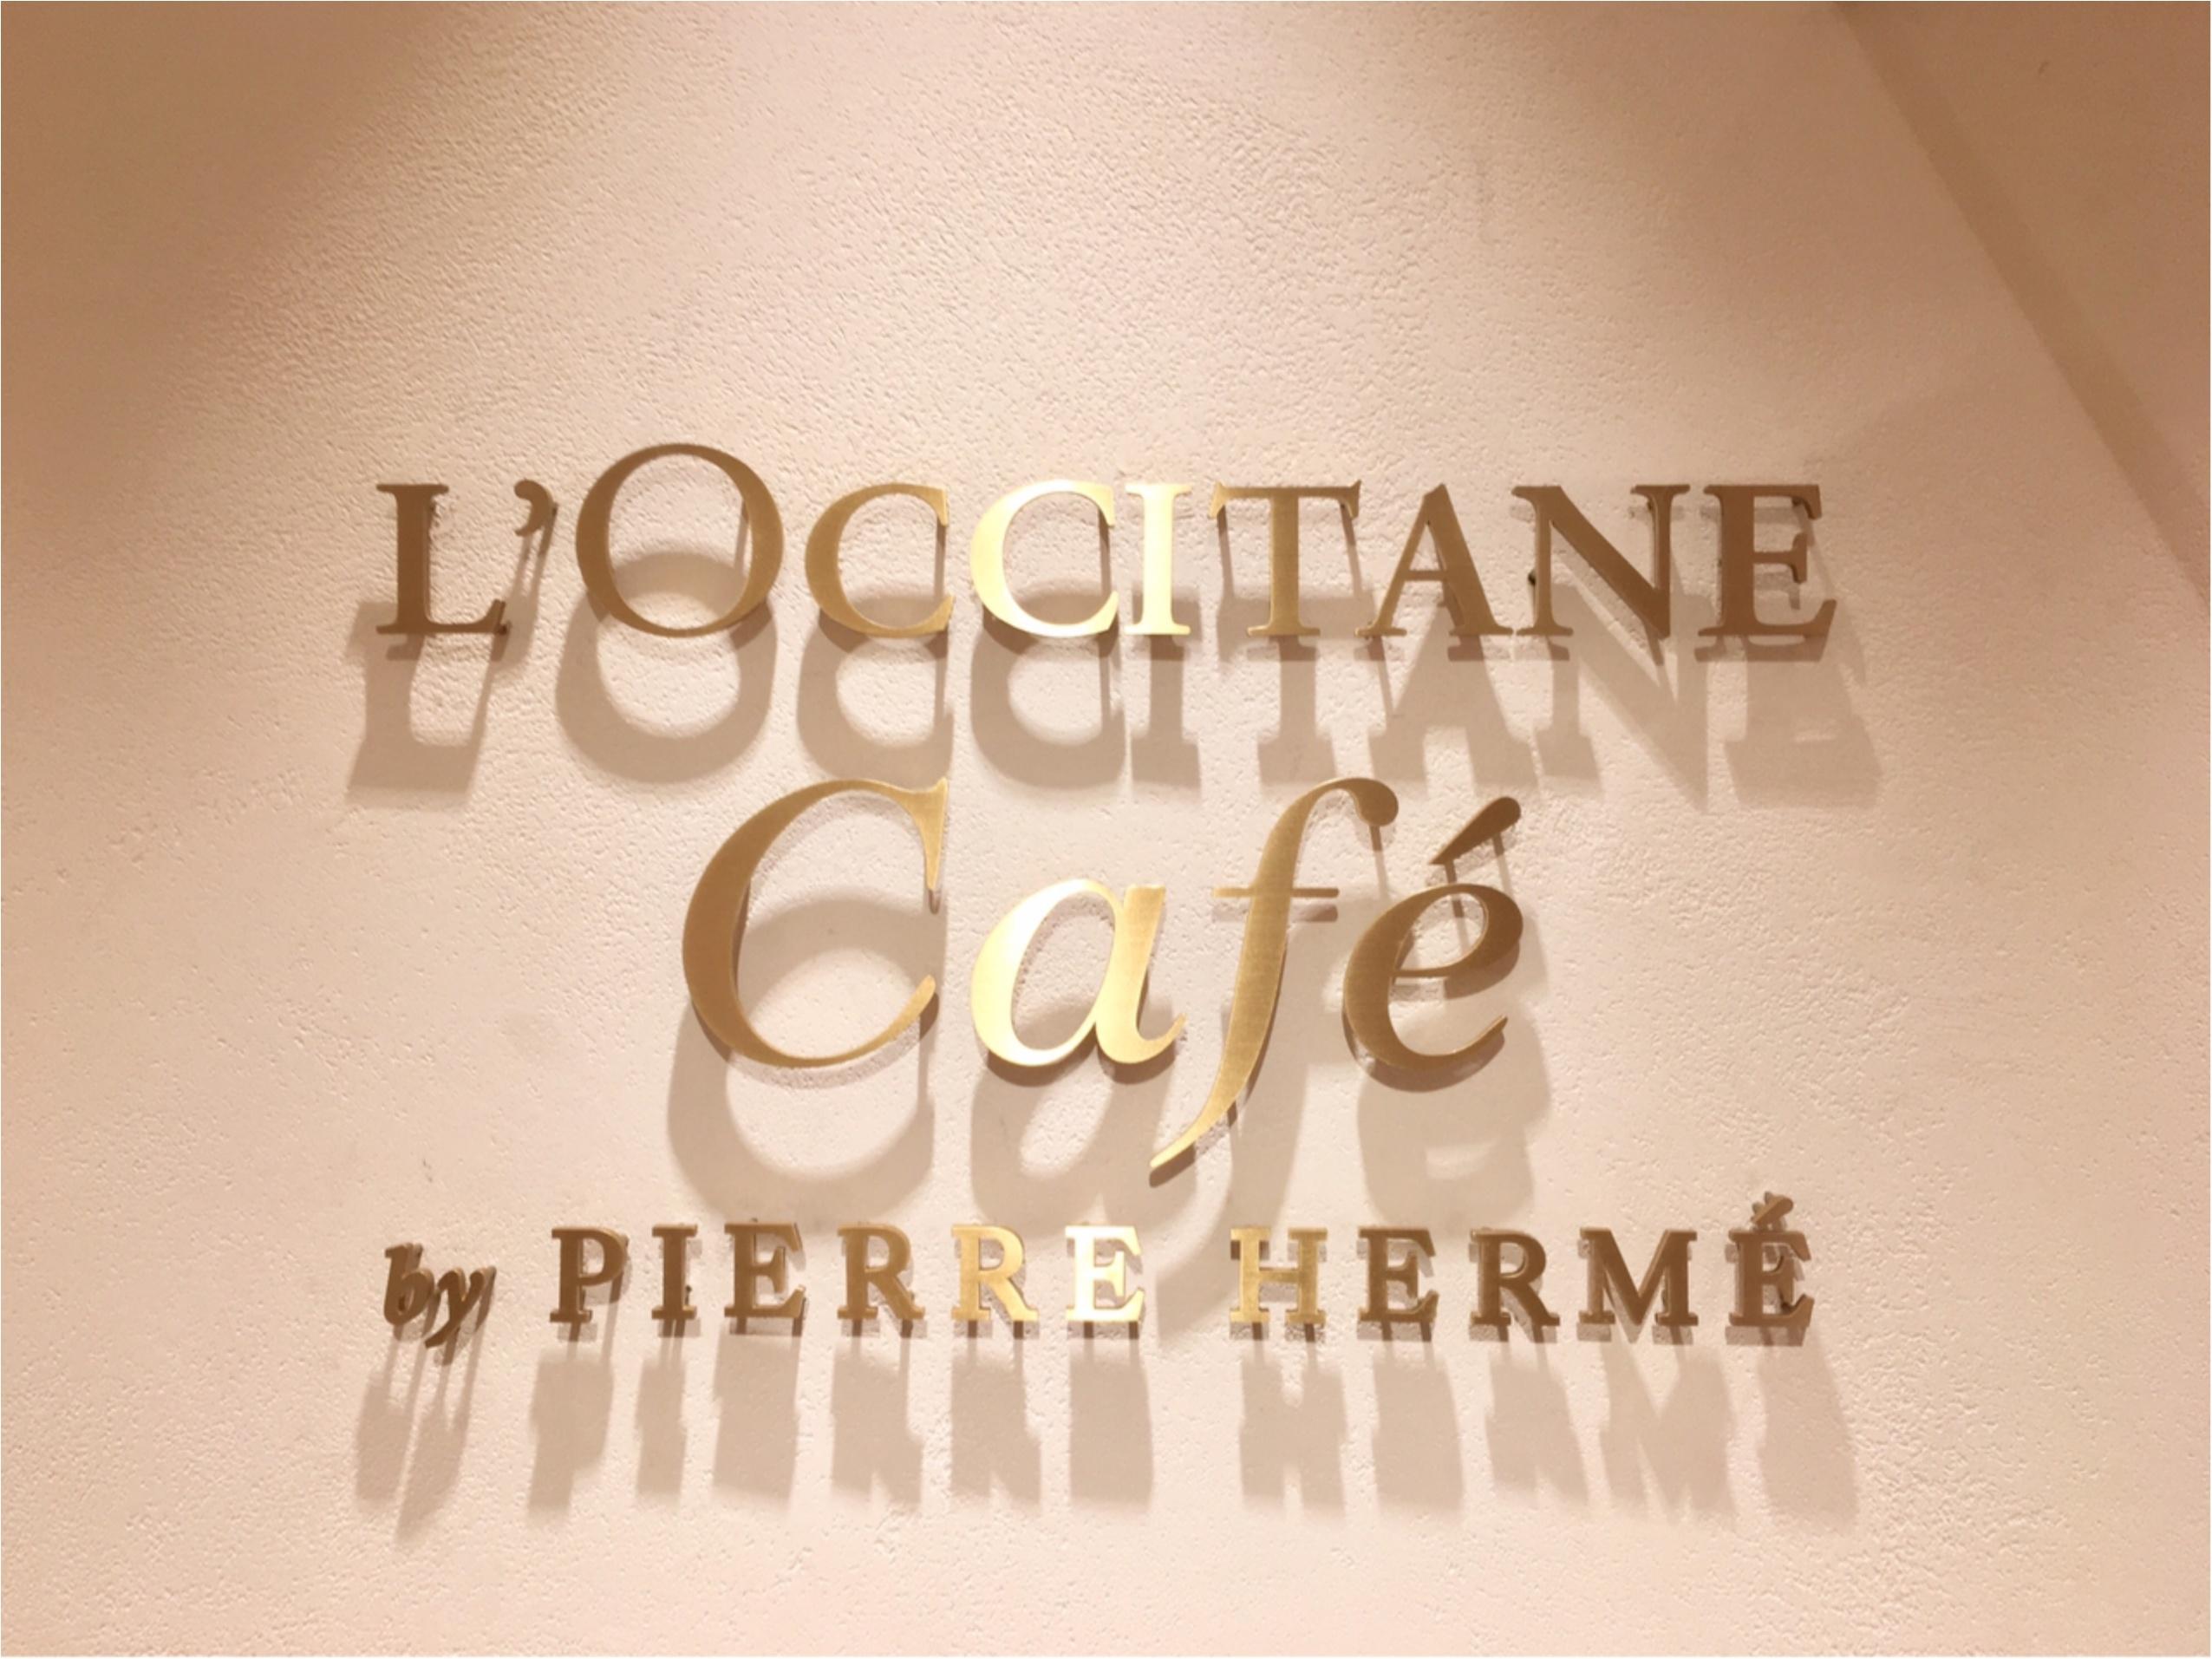 L'OCCITANE Café by Pierre Hermé(ロクシタンカフェ バイ ピエール・エルメ)へ♡_1